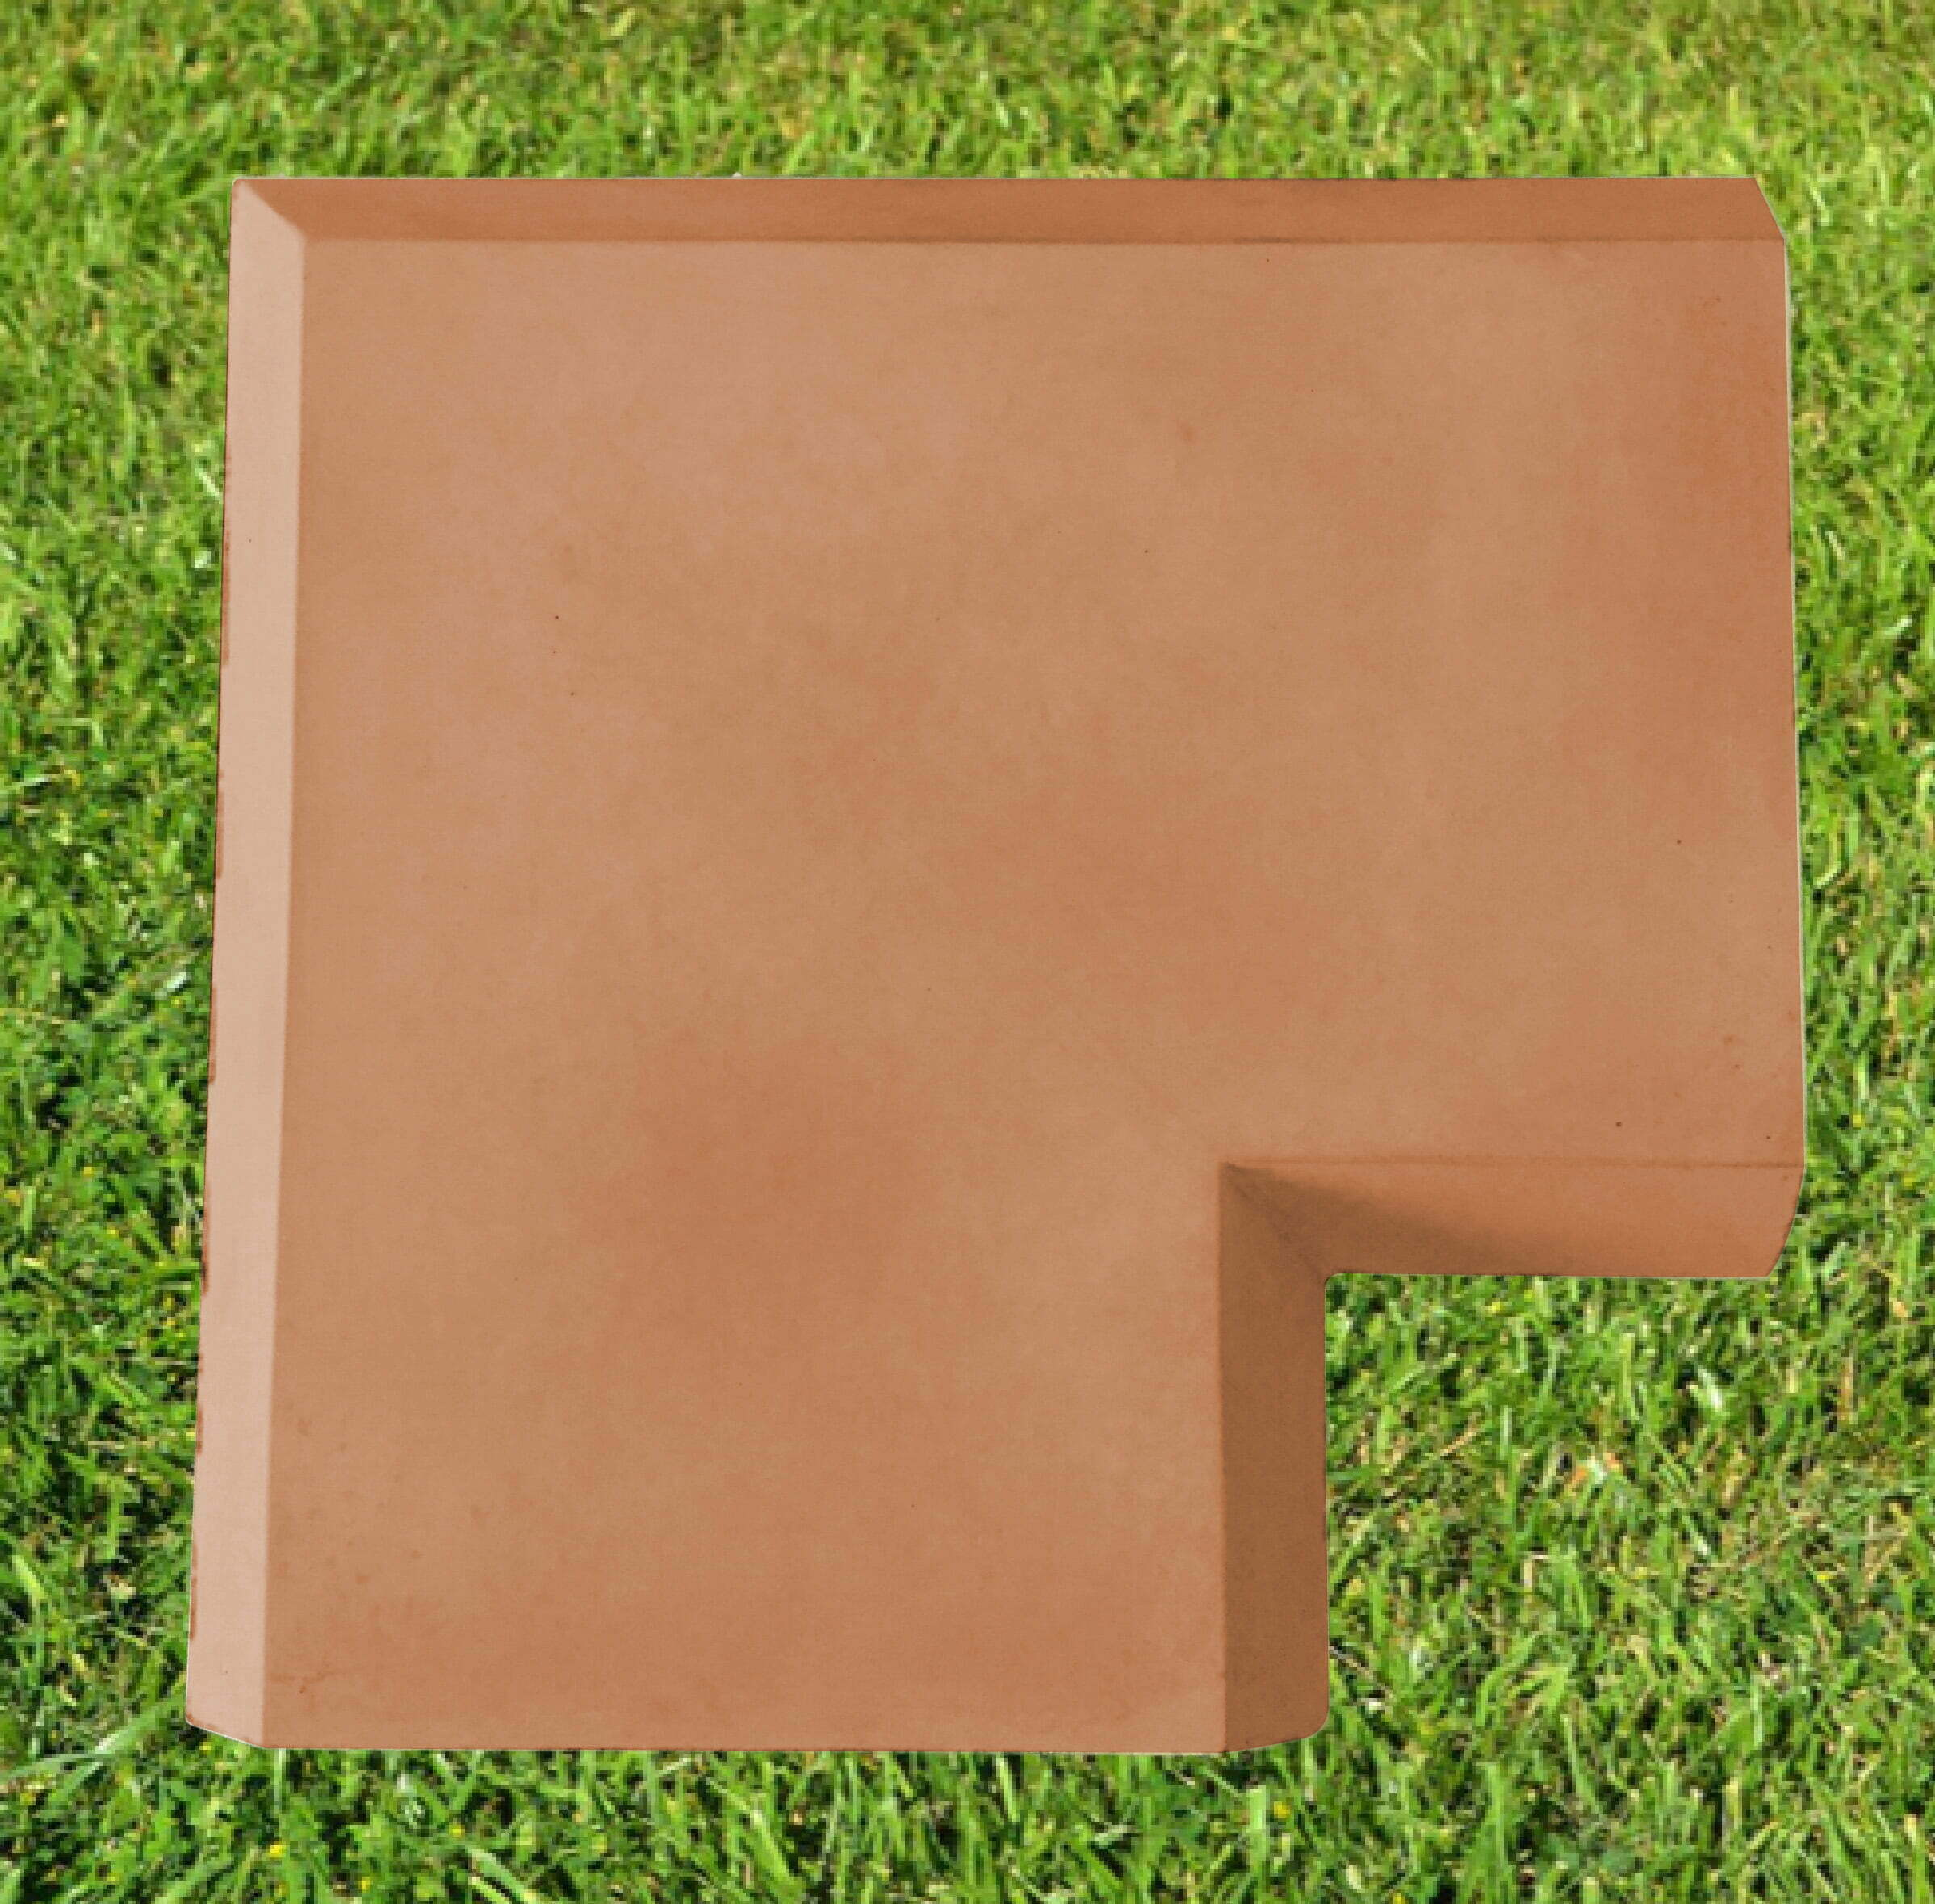 Terracotta 15 inch corner coping stone